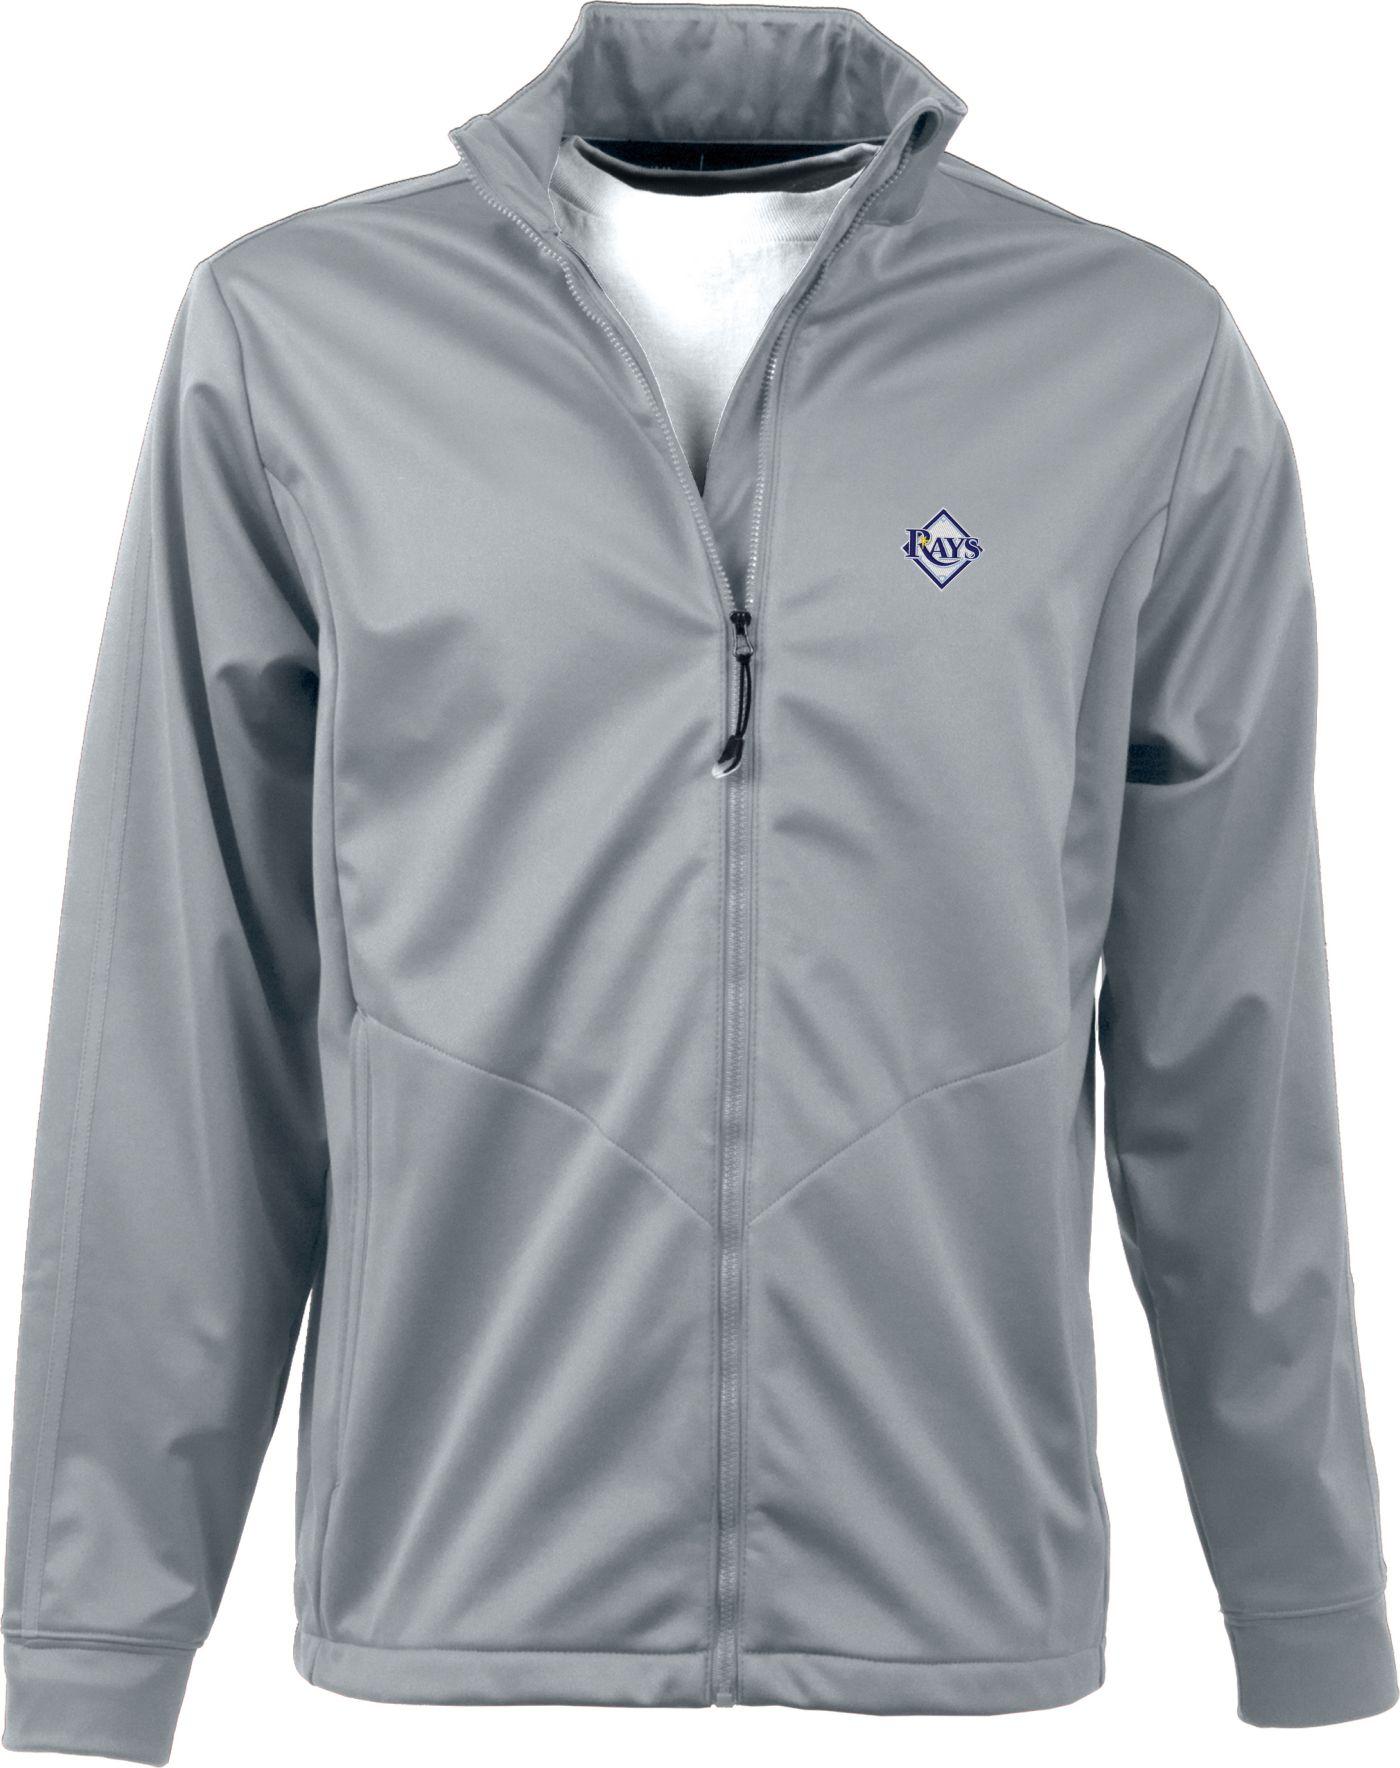 Antigua Men's Tampa Bay Rays Full-Zip Silver Golf Jacket